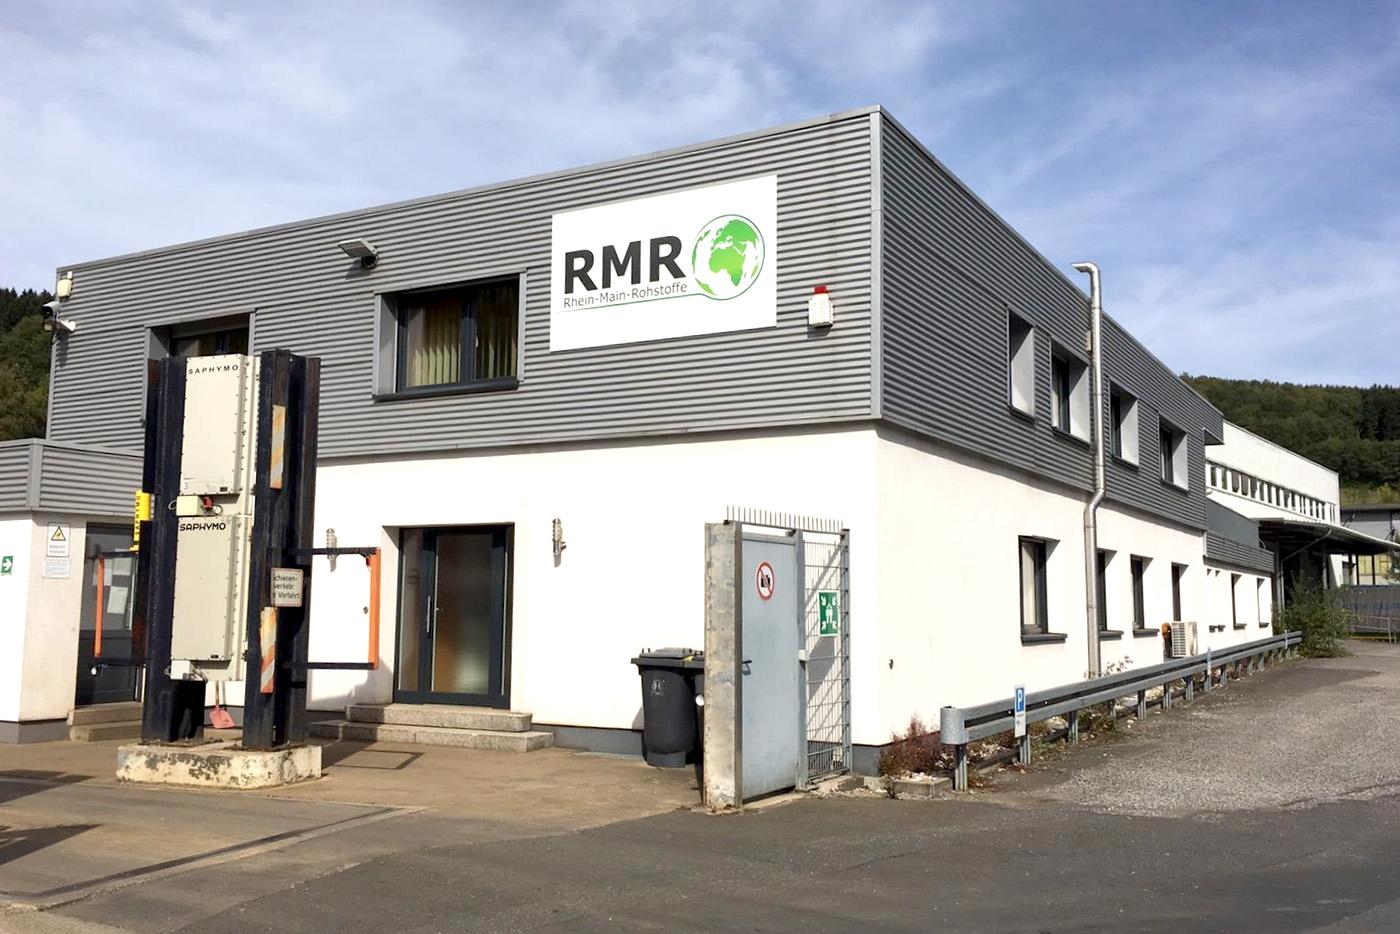 RMR Gebäude